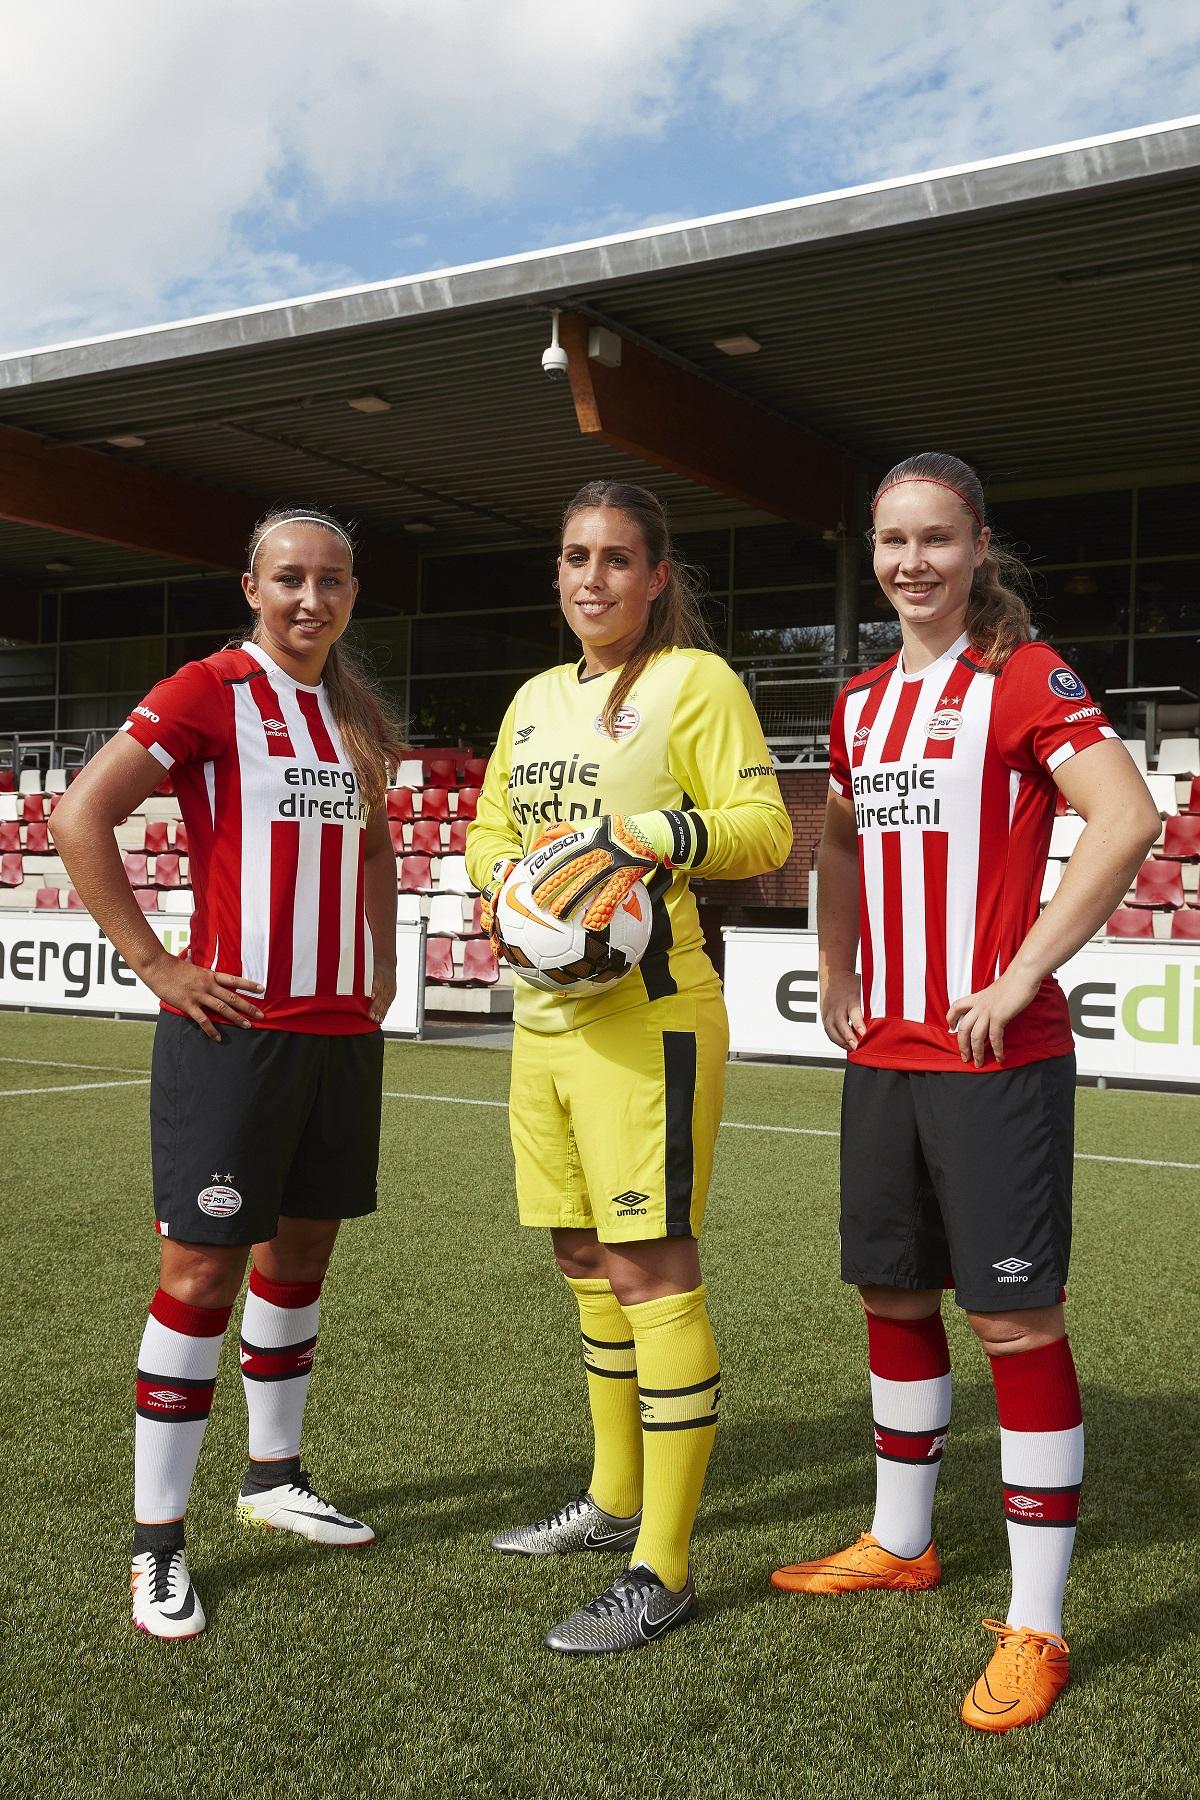 94d84806a Female goalkeeper wants Dutch and European Cup - Eindhoven News